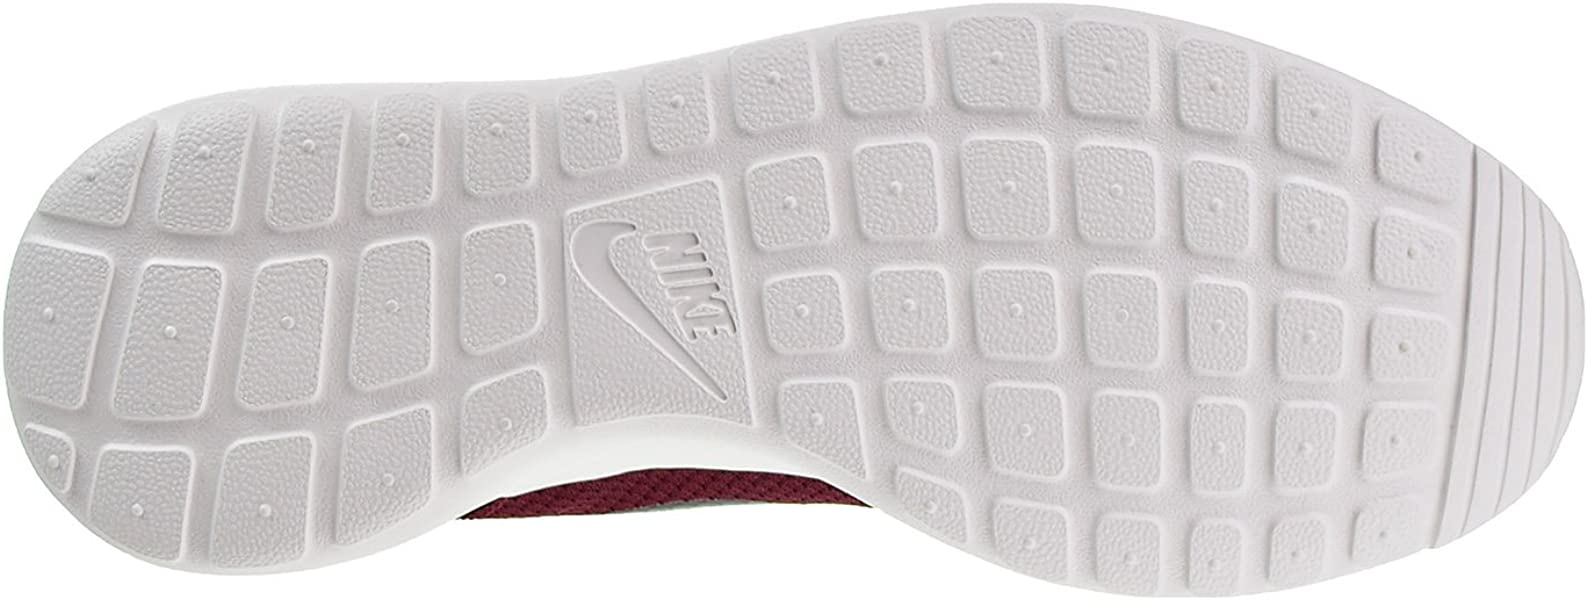 29c59c6a06ef NIKE Roshe One Mens Shoes Team Red Black Summit White 511881-607 (11 ...